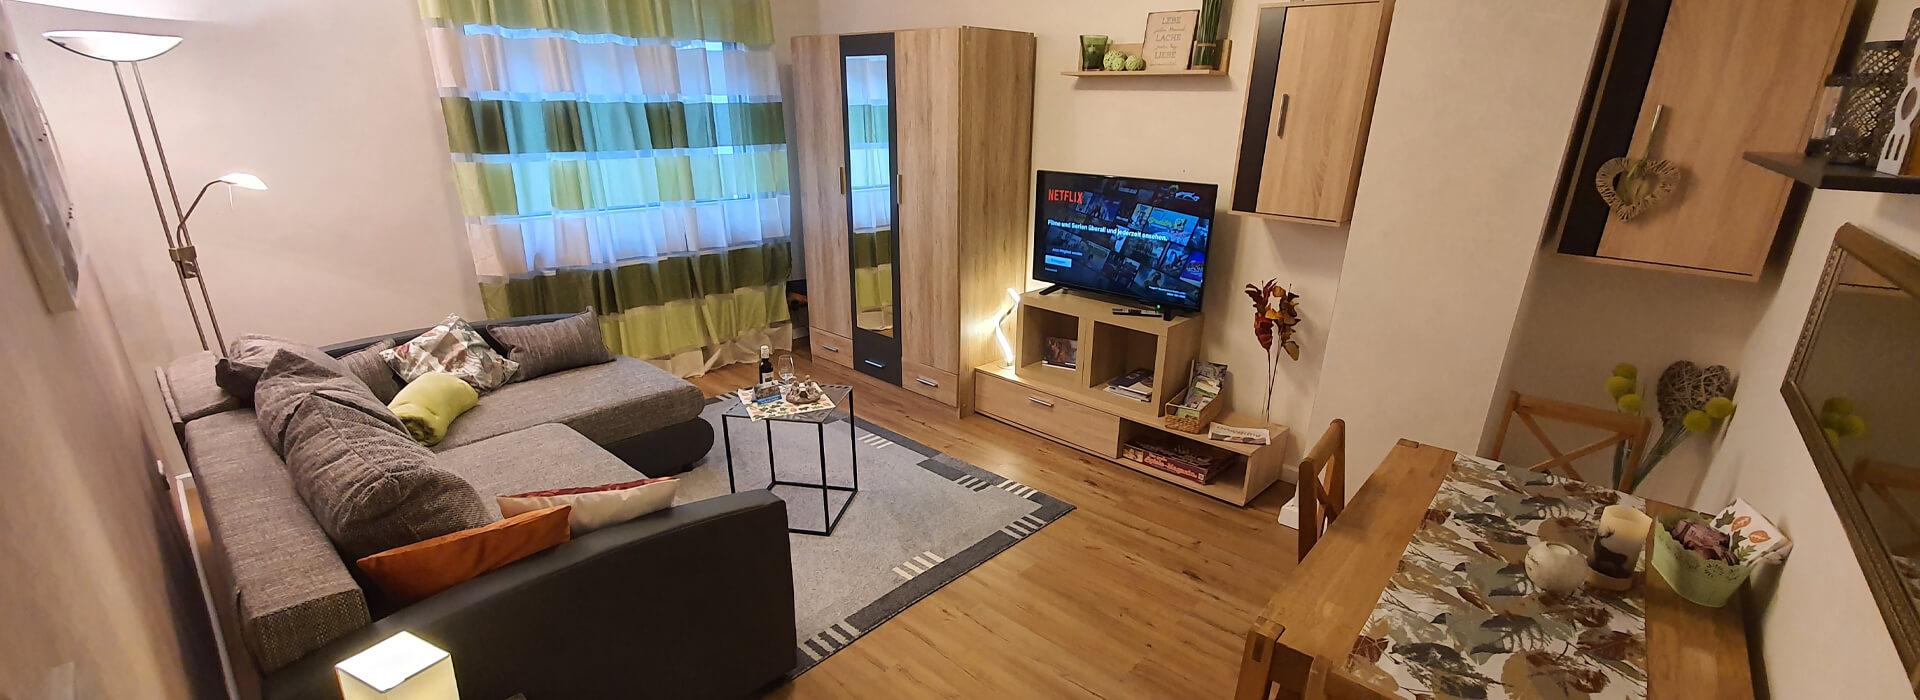 og-schlafzimmer-fewoamblauenhut